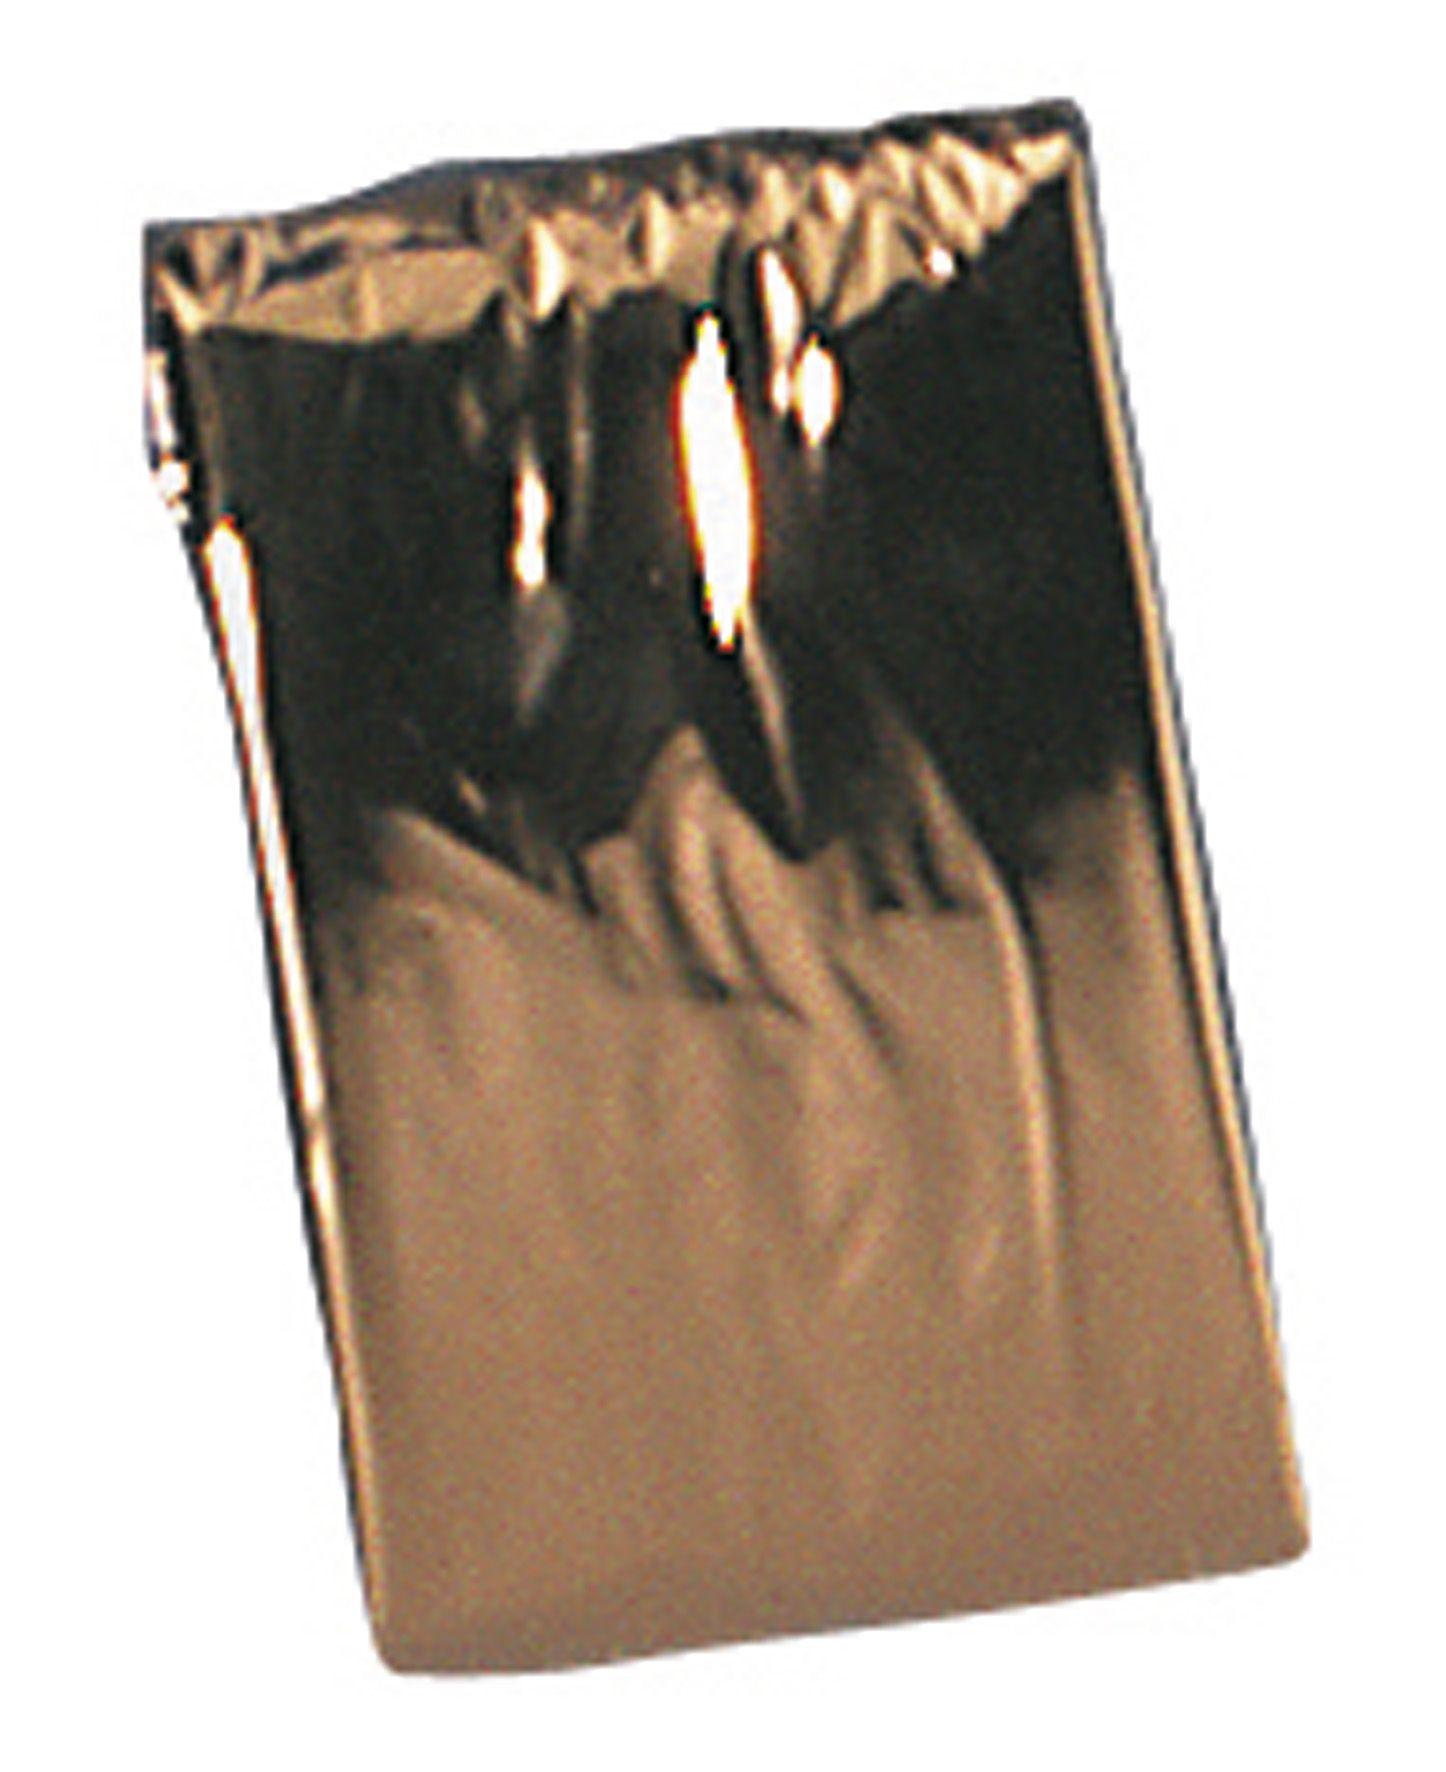 Vaude Rescue Blanket Rettungsdecke gold/ silber Kälte Wärmeschutz